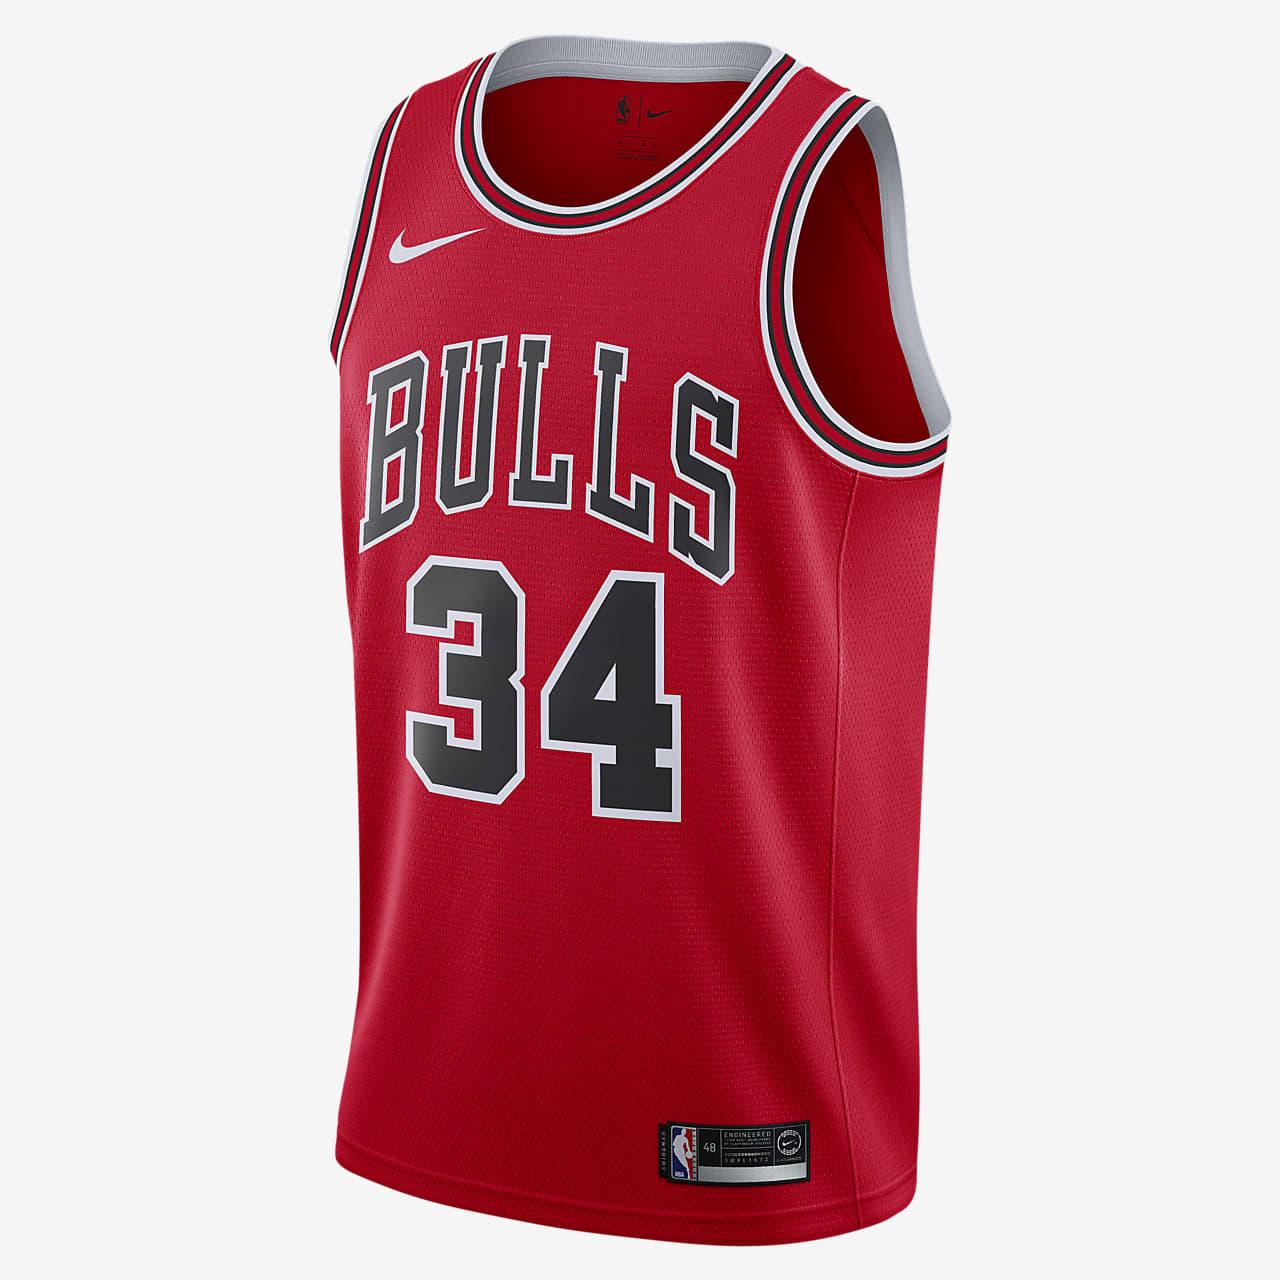 Acelerar Lugar de la noche Derribar  Camiseta conectada Nike NBA para hombre Icon Edition Swingman (Chicago  Bulls). Nike.com